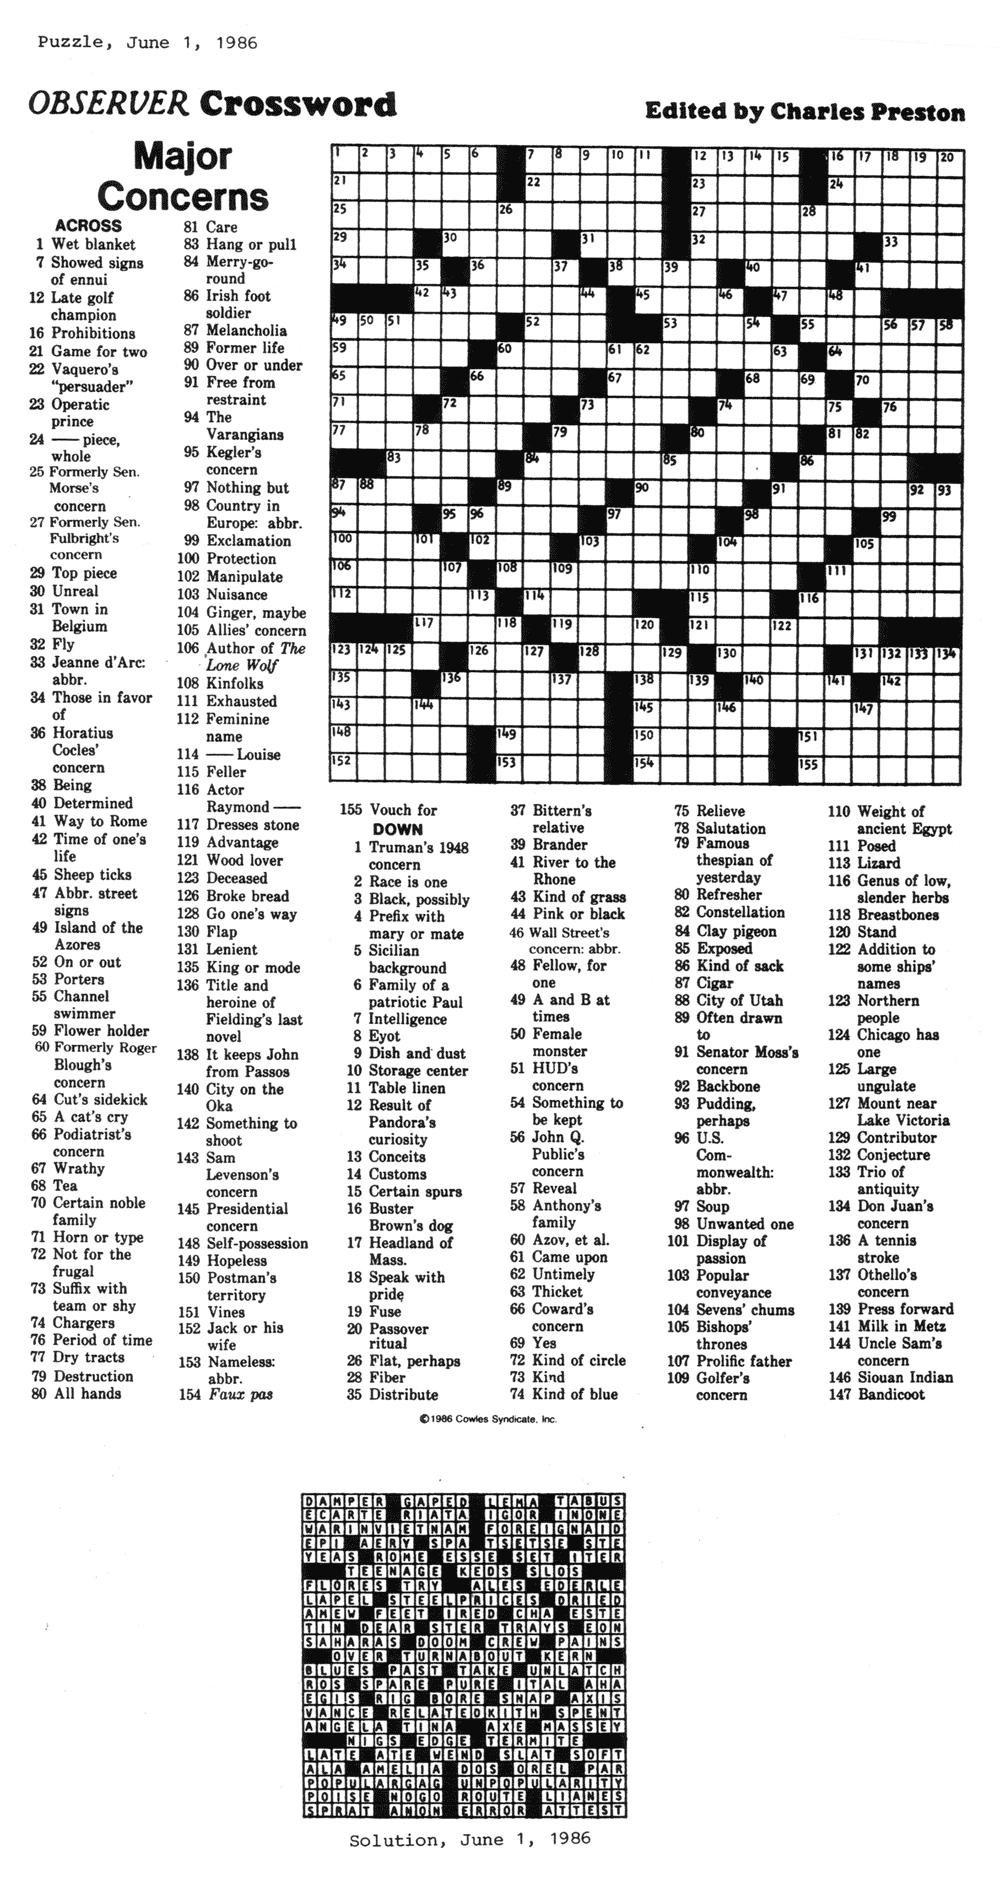 Eugene Sheffer Crossword Puzzle Printable - Printable 360 Degree - Printable Crossword Puzzles Eugene Sheffer